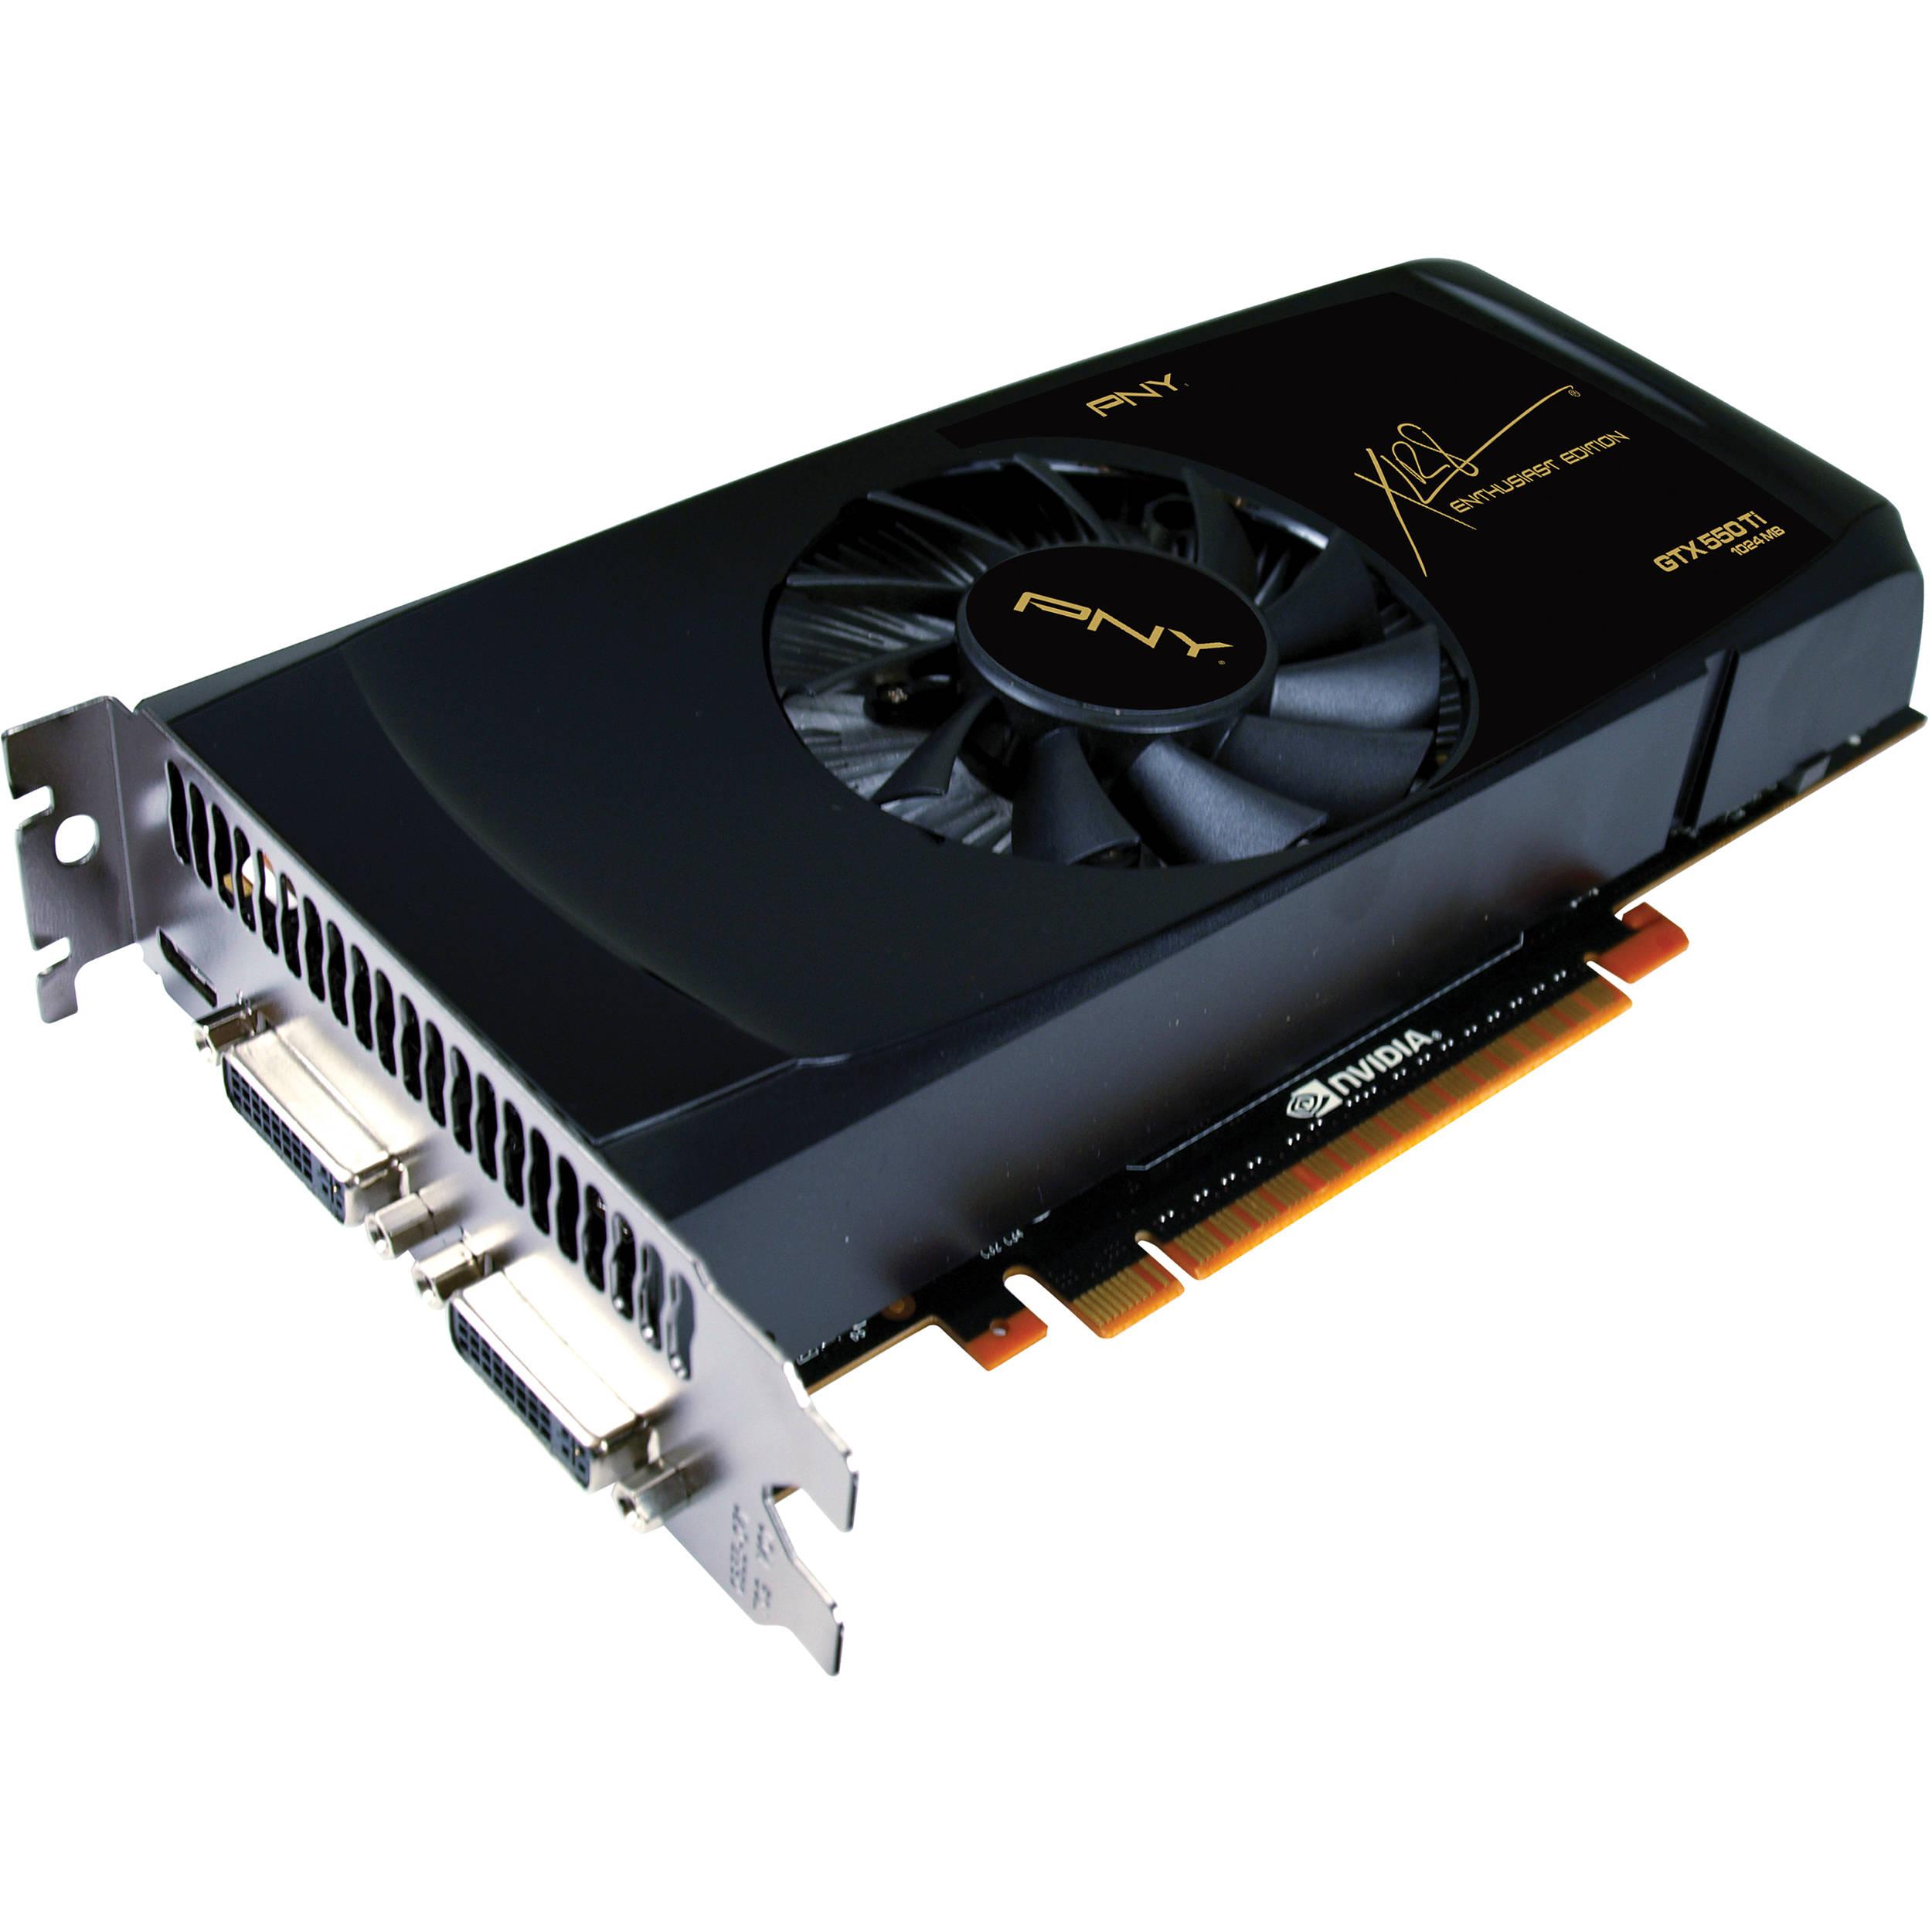 Gv-n550wf2-1gi | placas de vídeo gigabyte brazil.